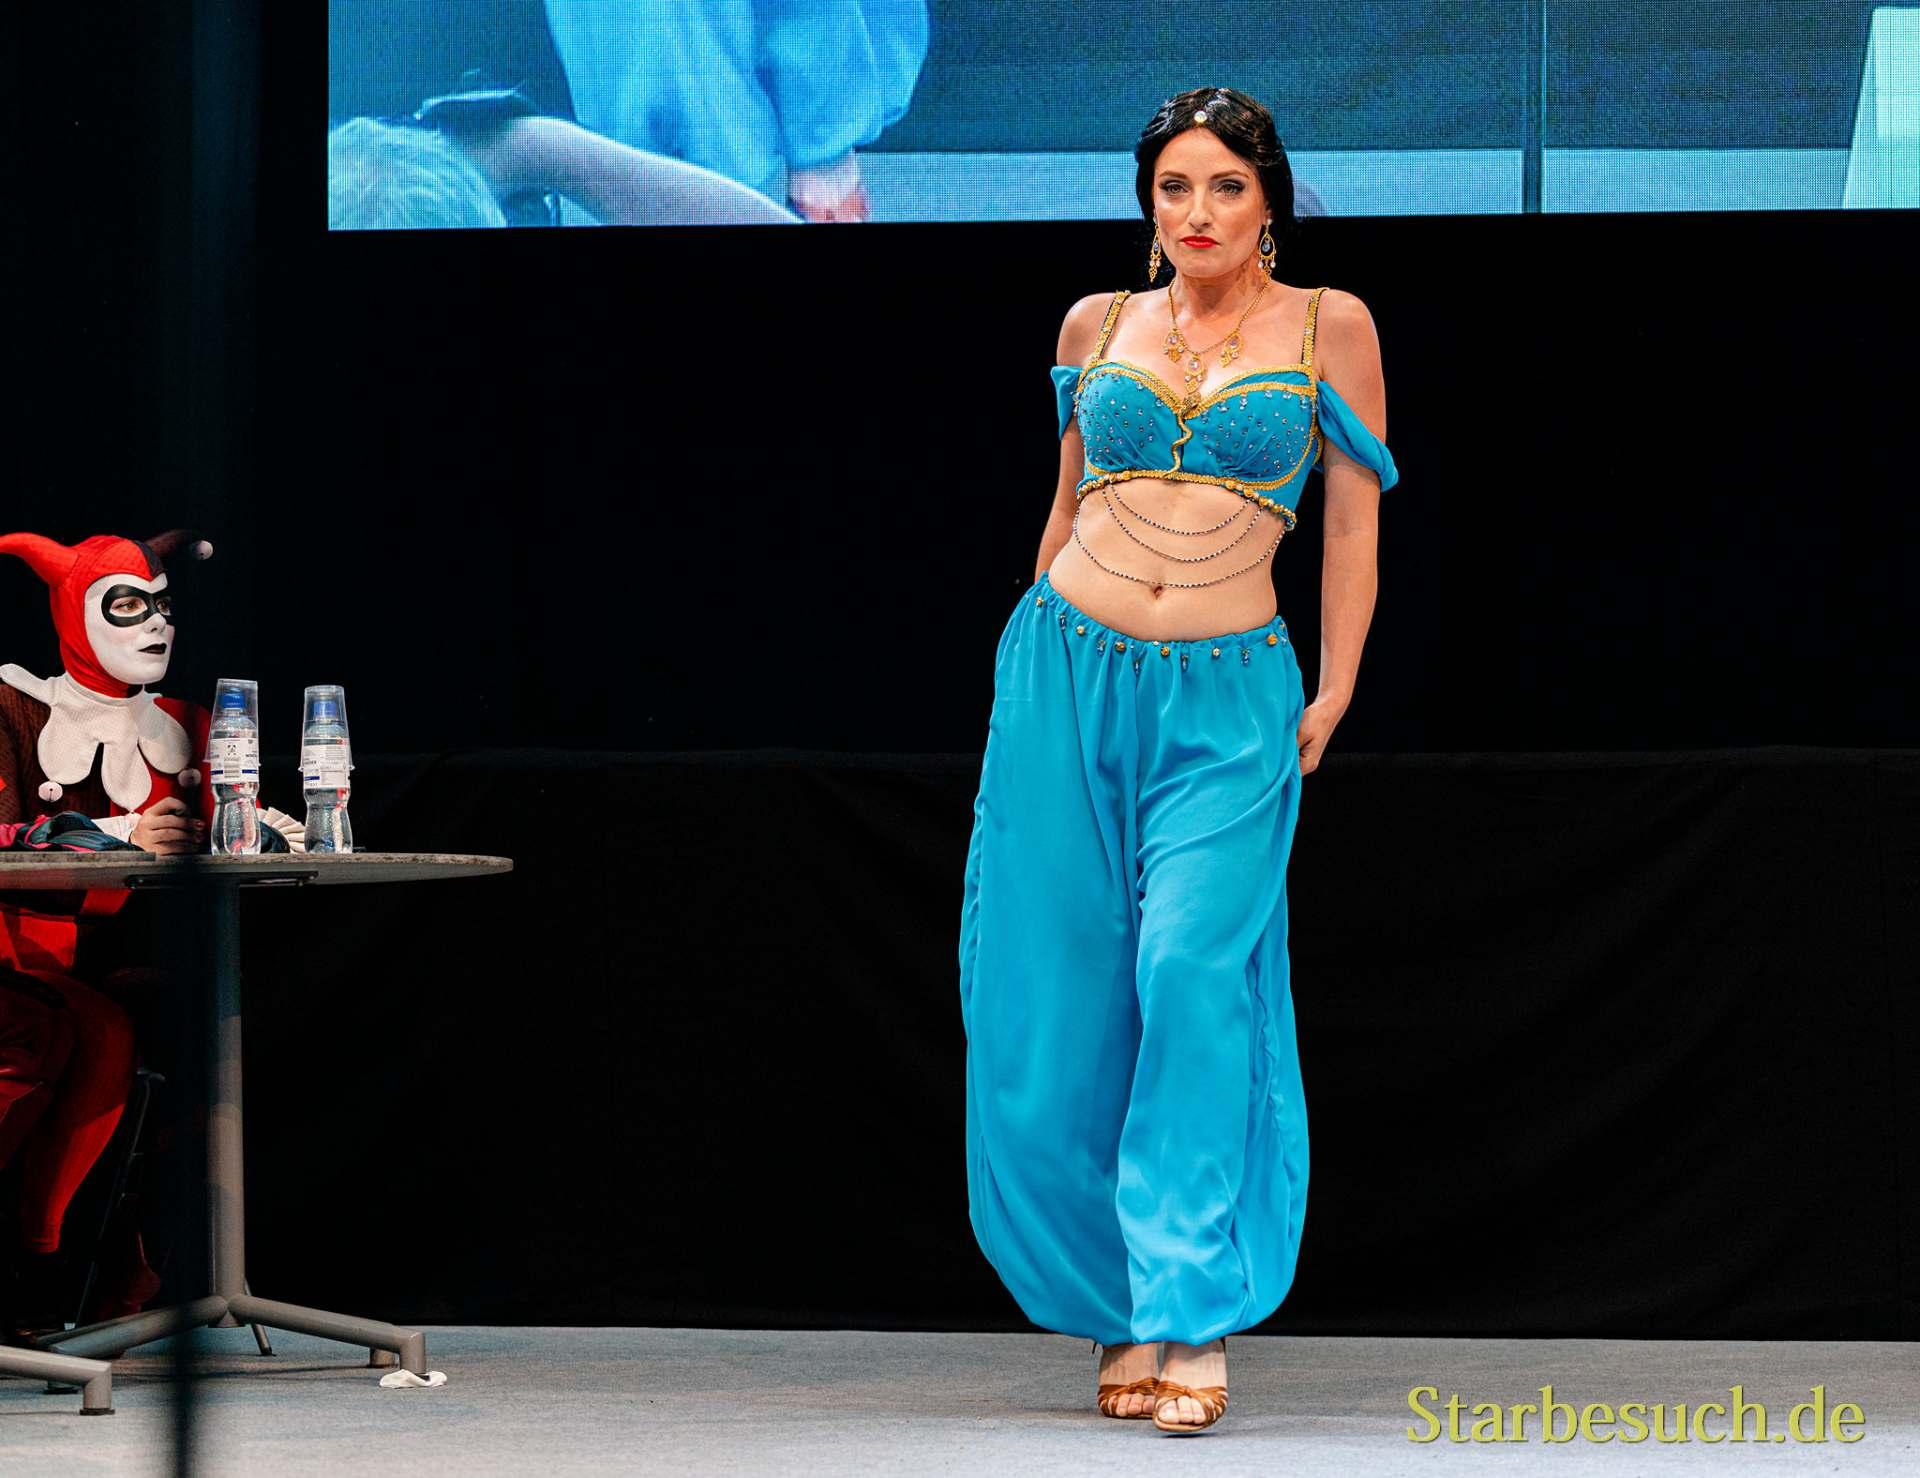 Cosplay Contest #11: Christina as Jasmin from Aladin